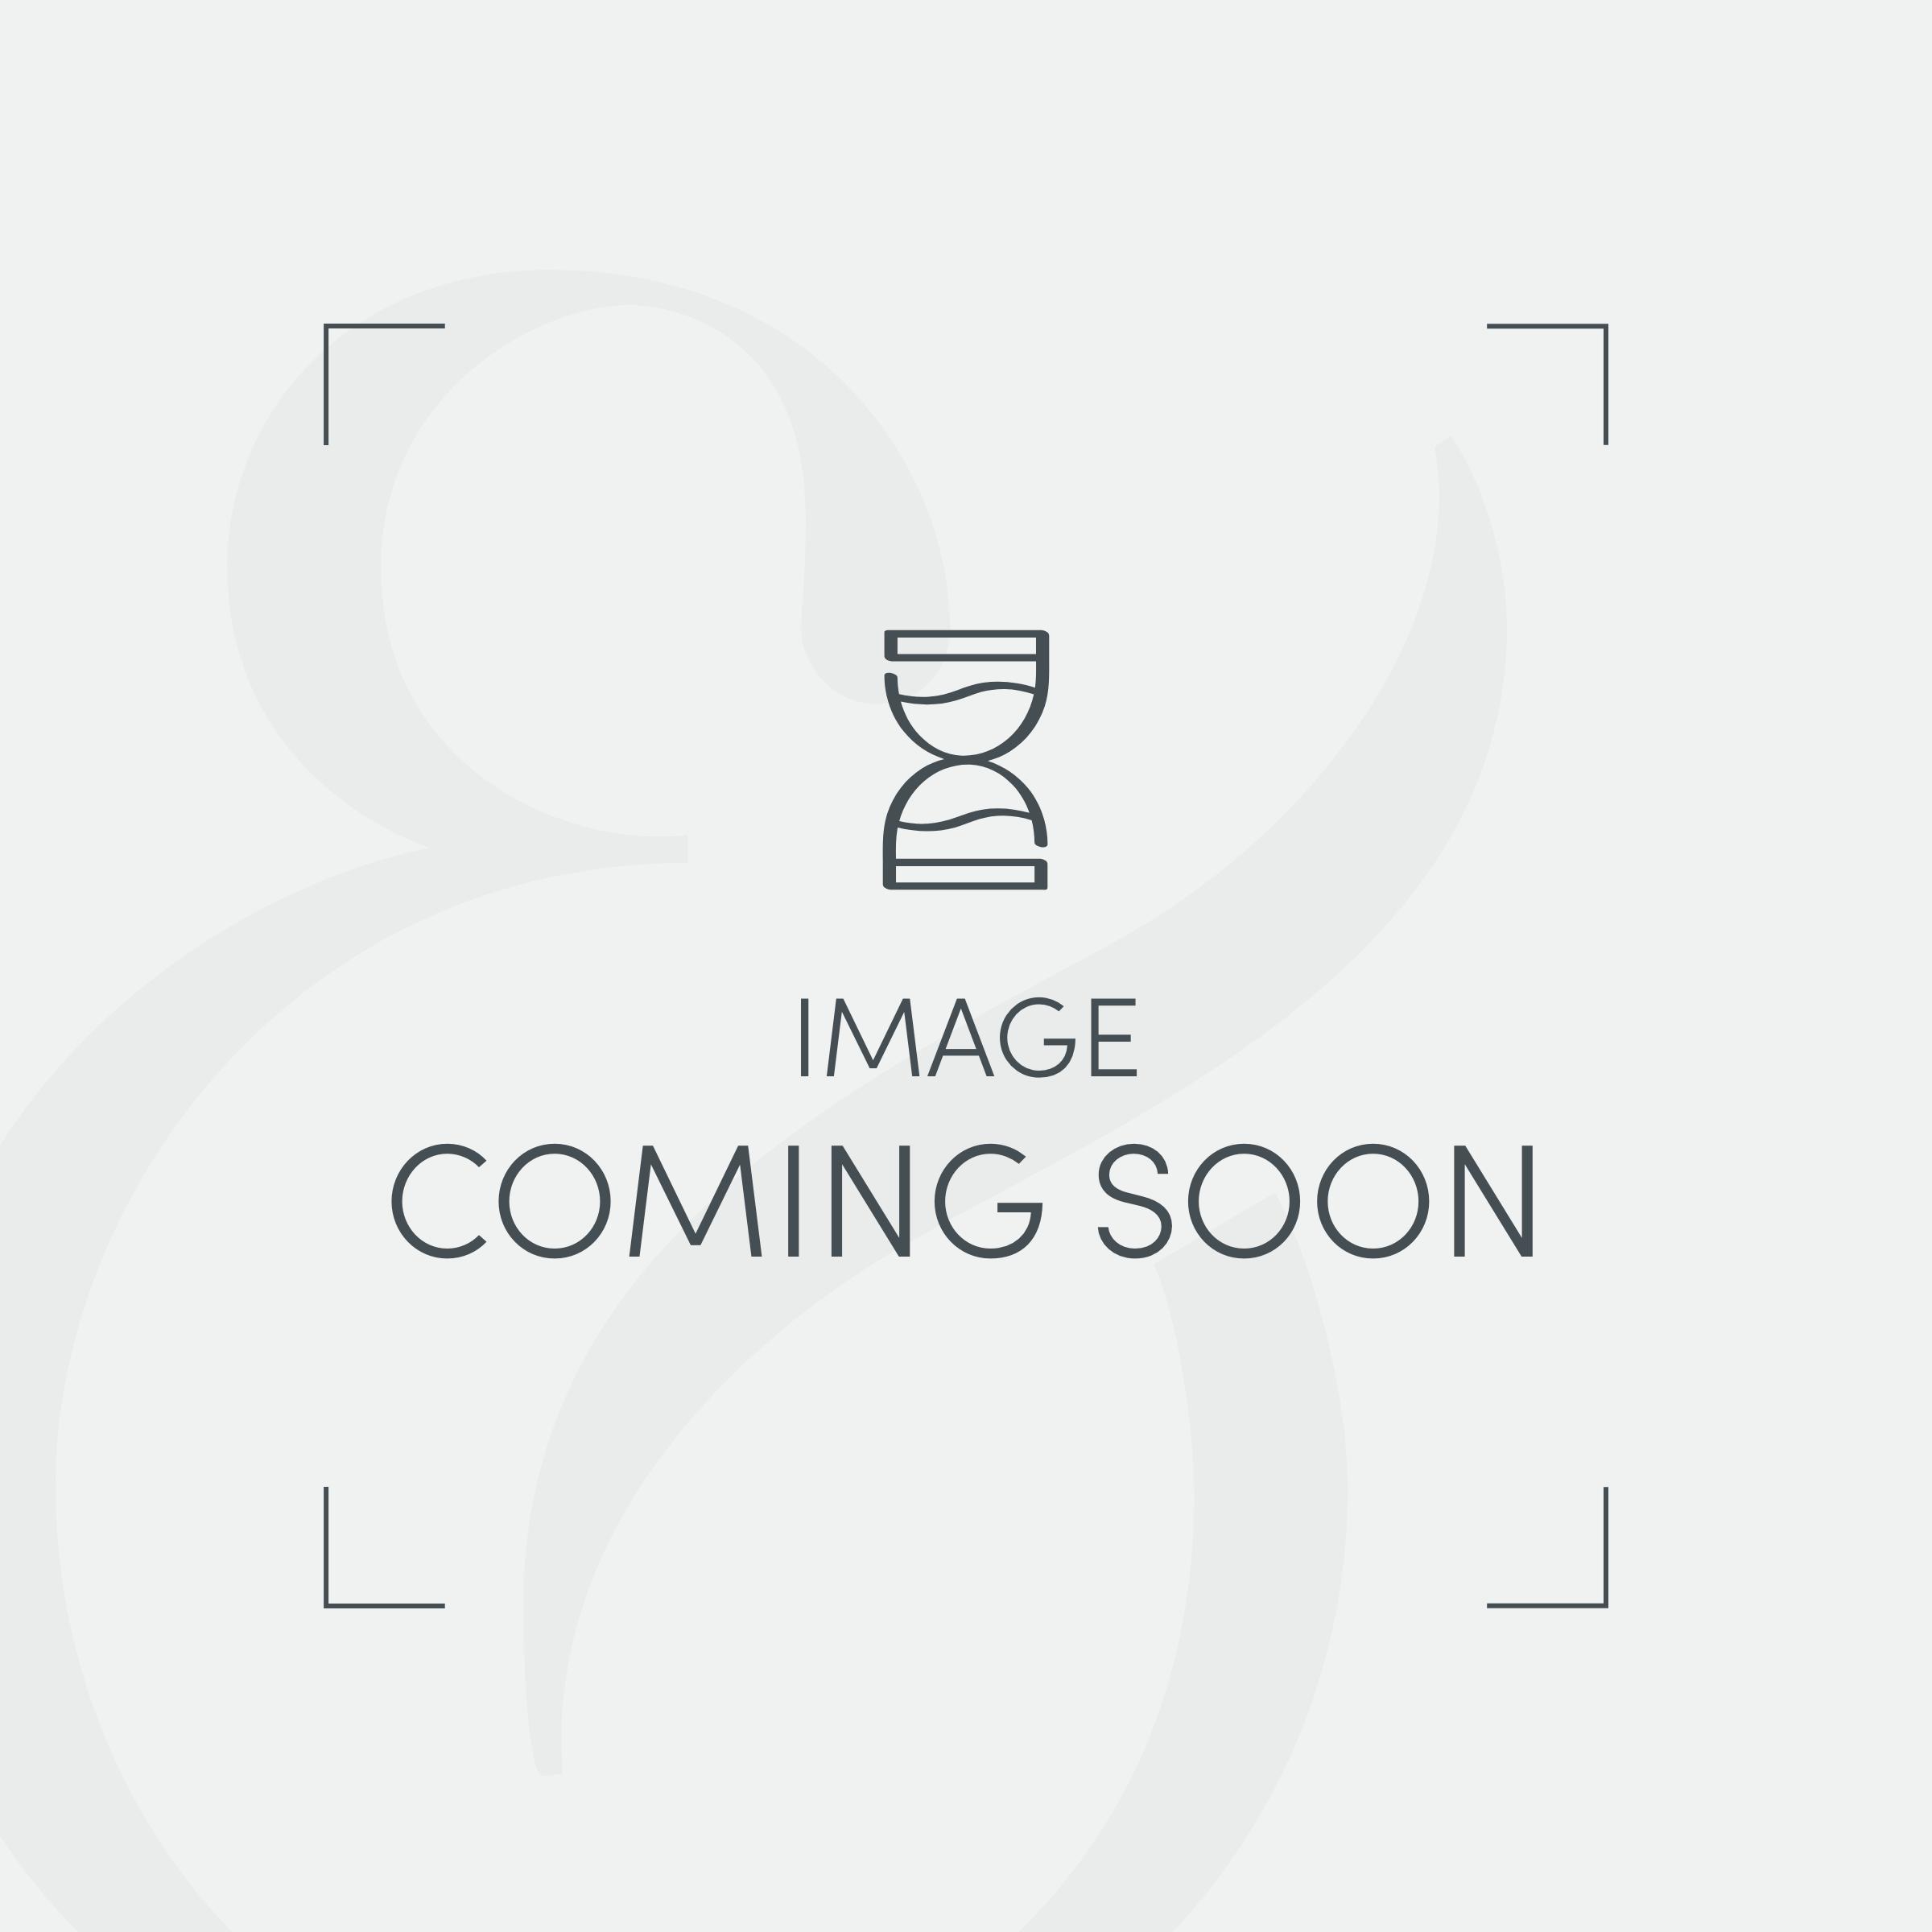 Waterproof Anti Bed Bug Mattress Encasement - Small Double